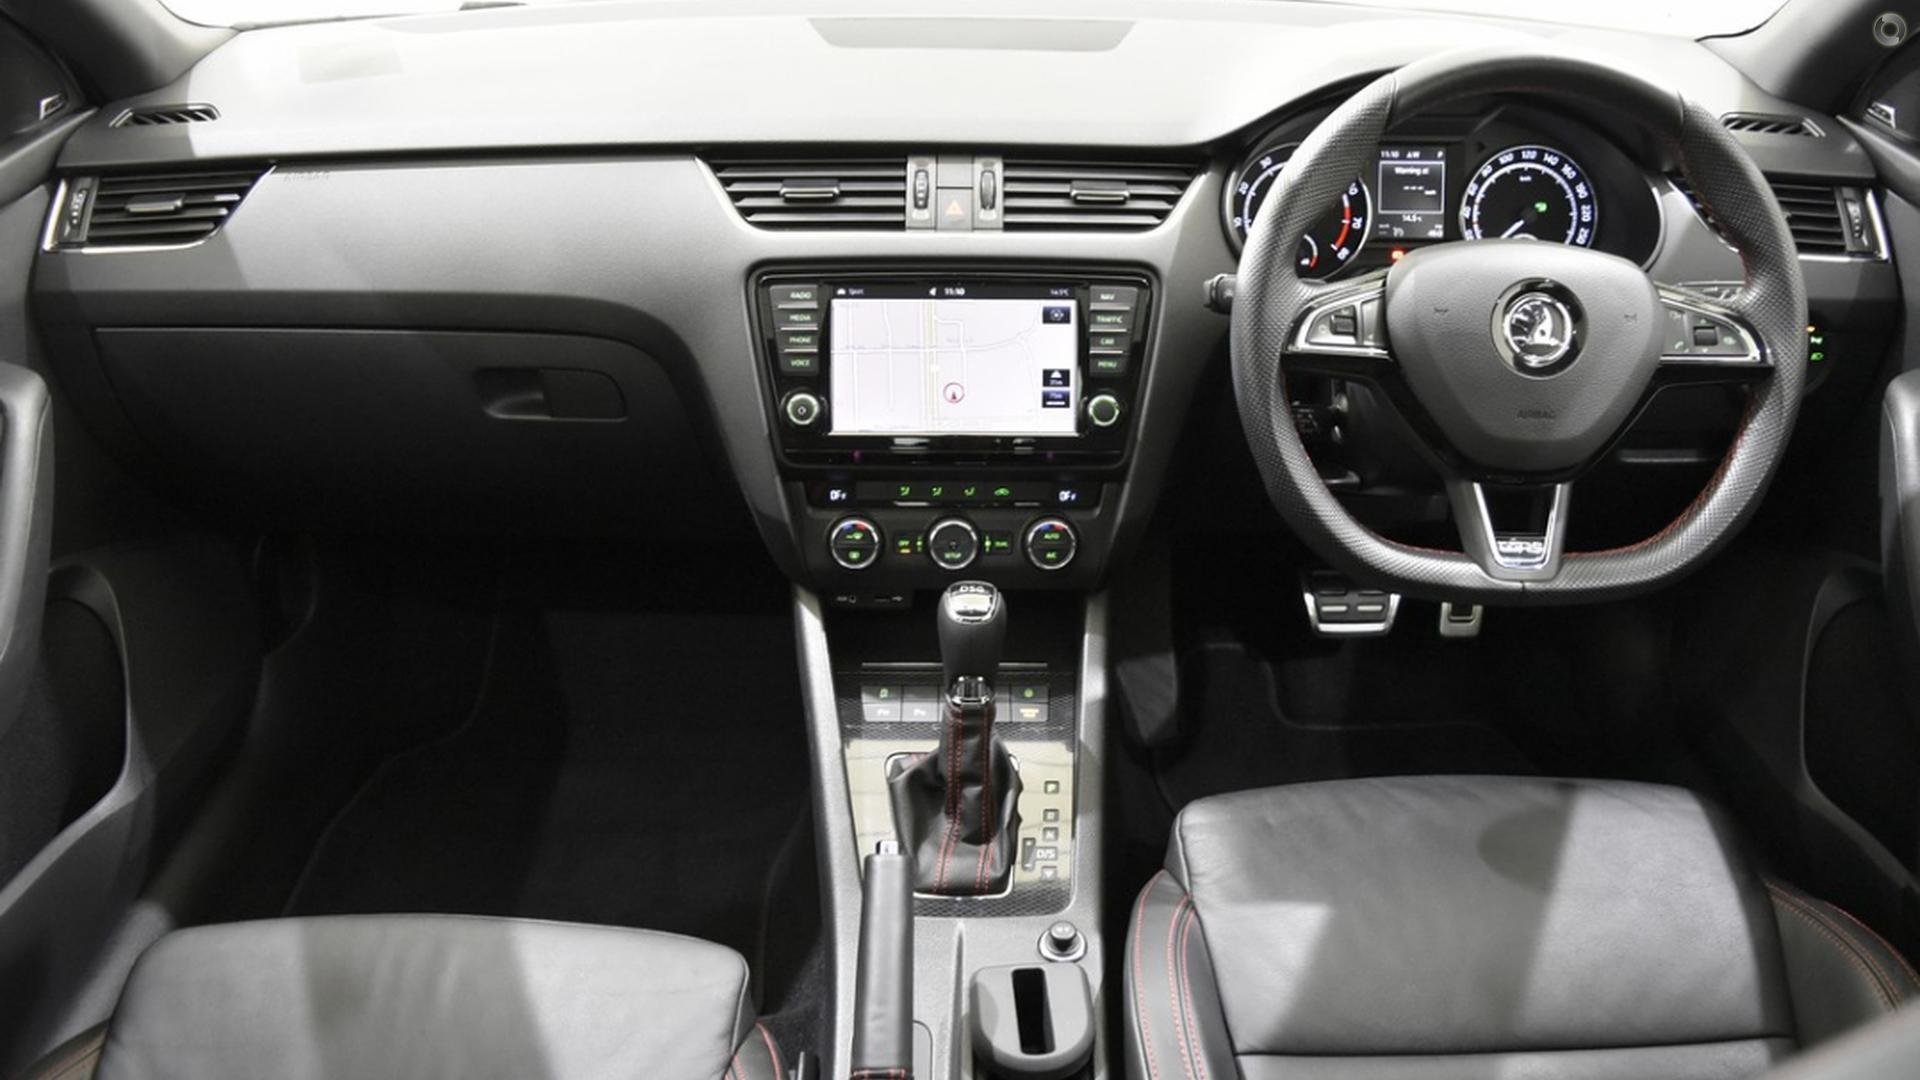 2014 SKODA Octavia RS 162TSI NE